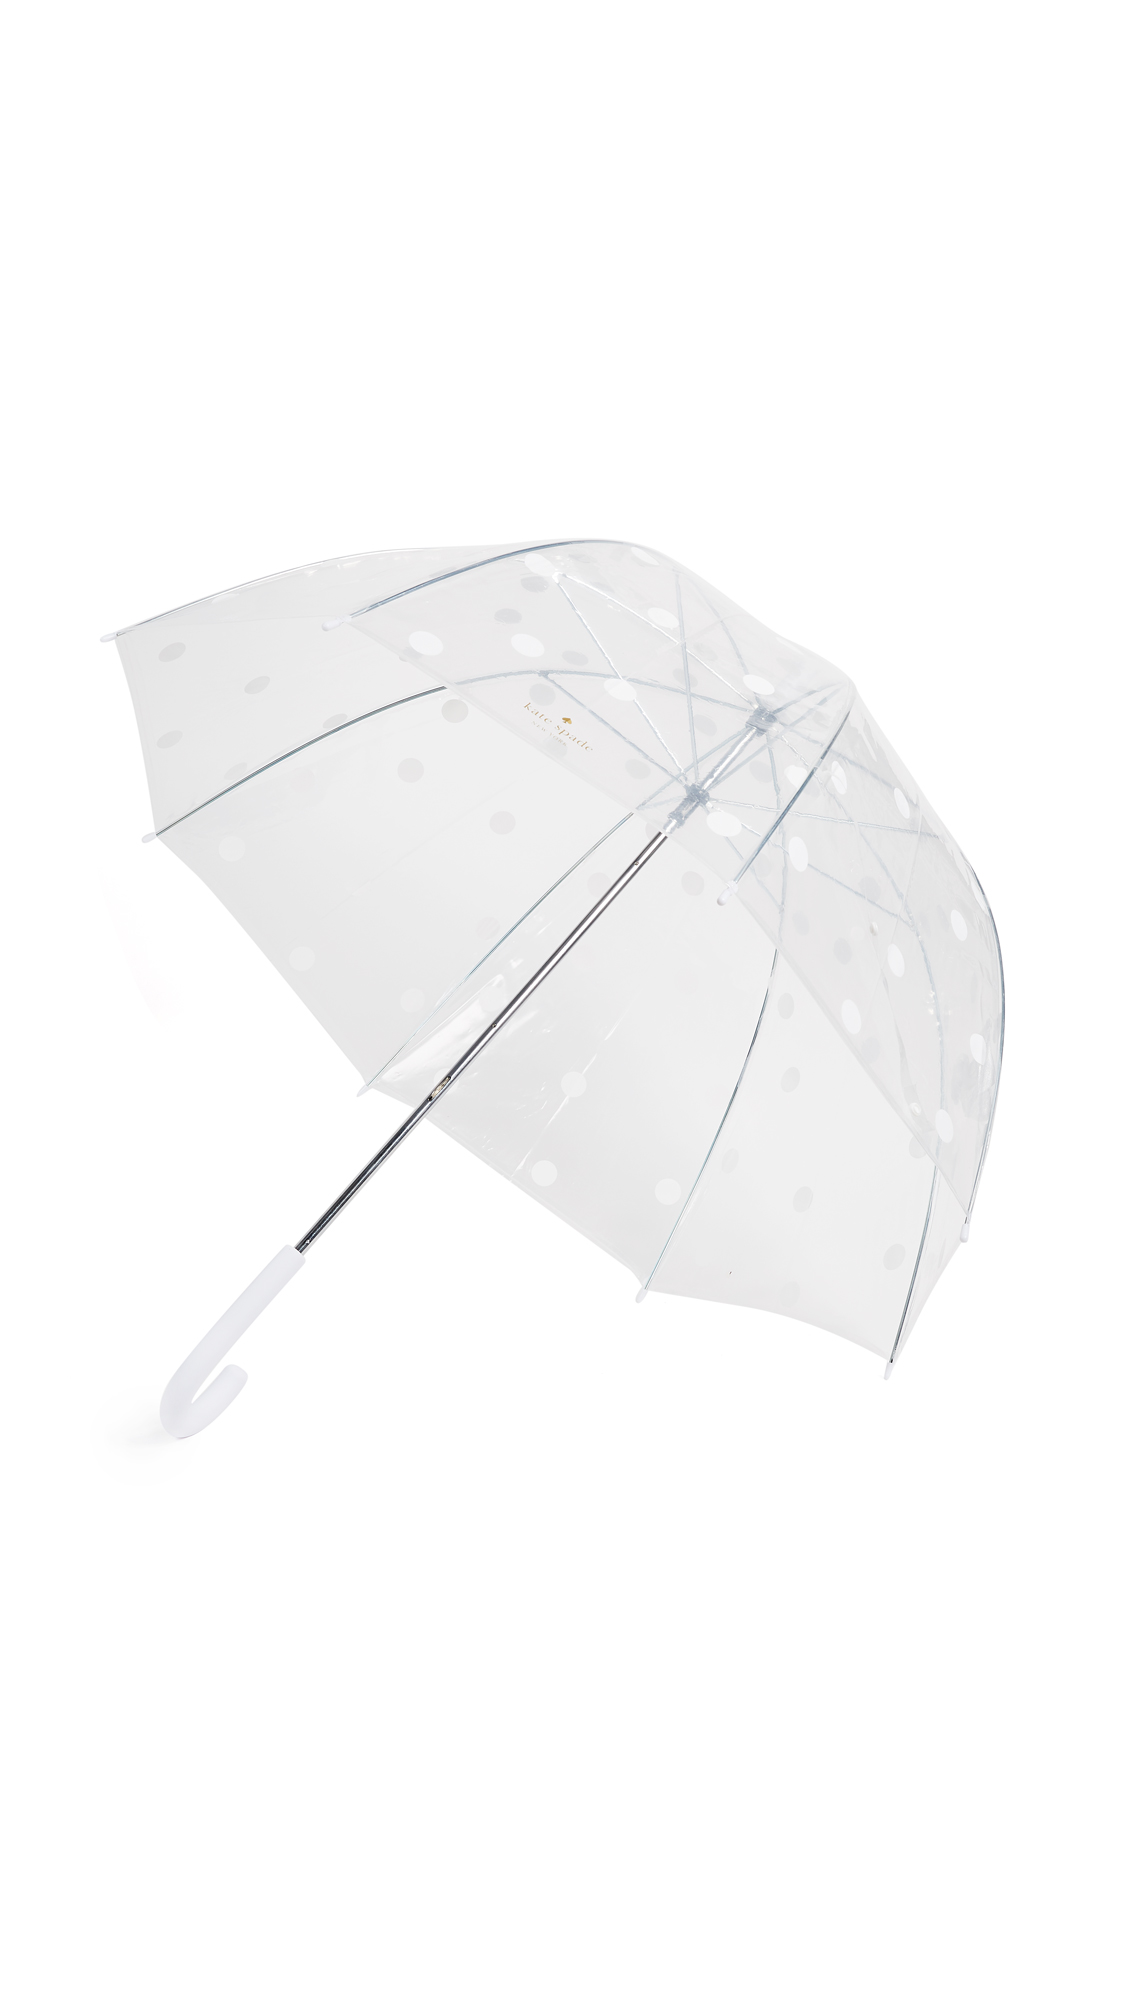 Kate Spade New York Dot Umbrella - White Dot